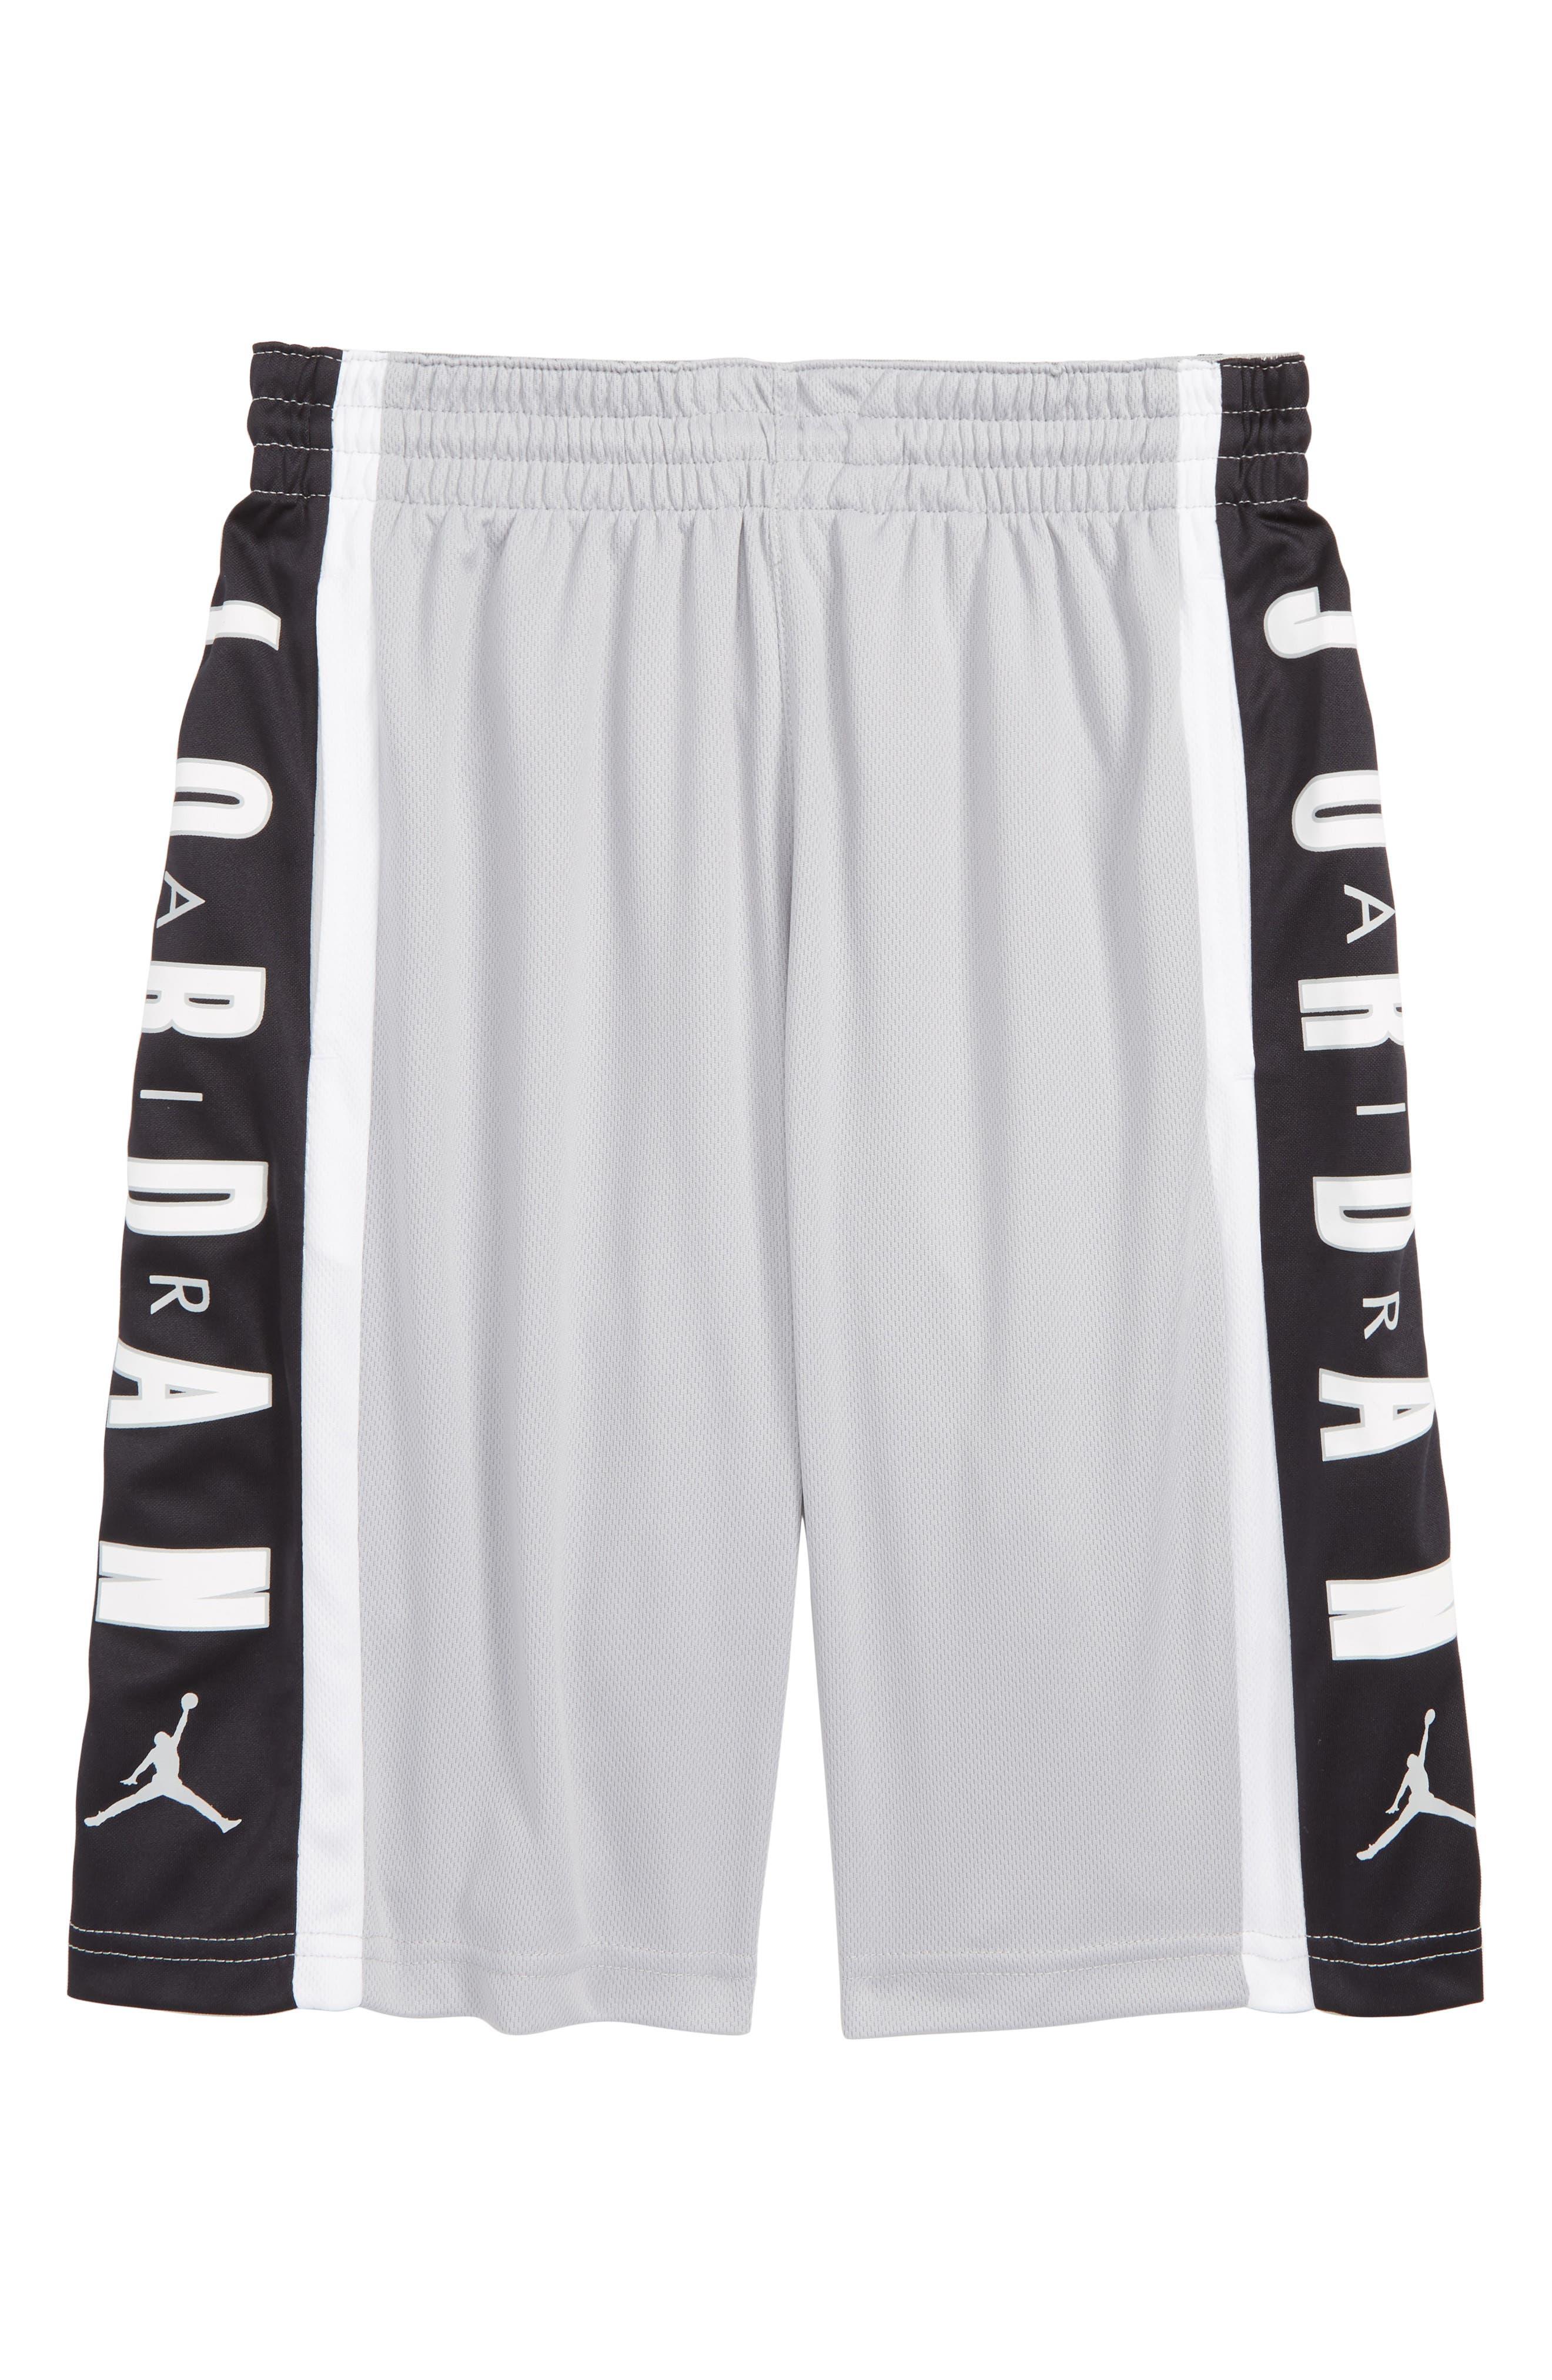 Rise3 Dri-FIT Basketball Shorts, Main, color, LIGHT SMOKE GREY